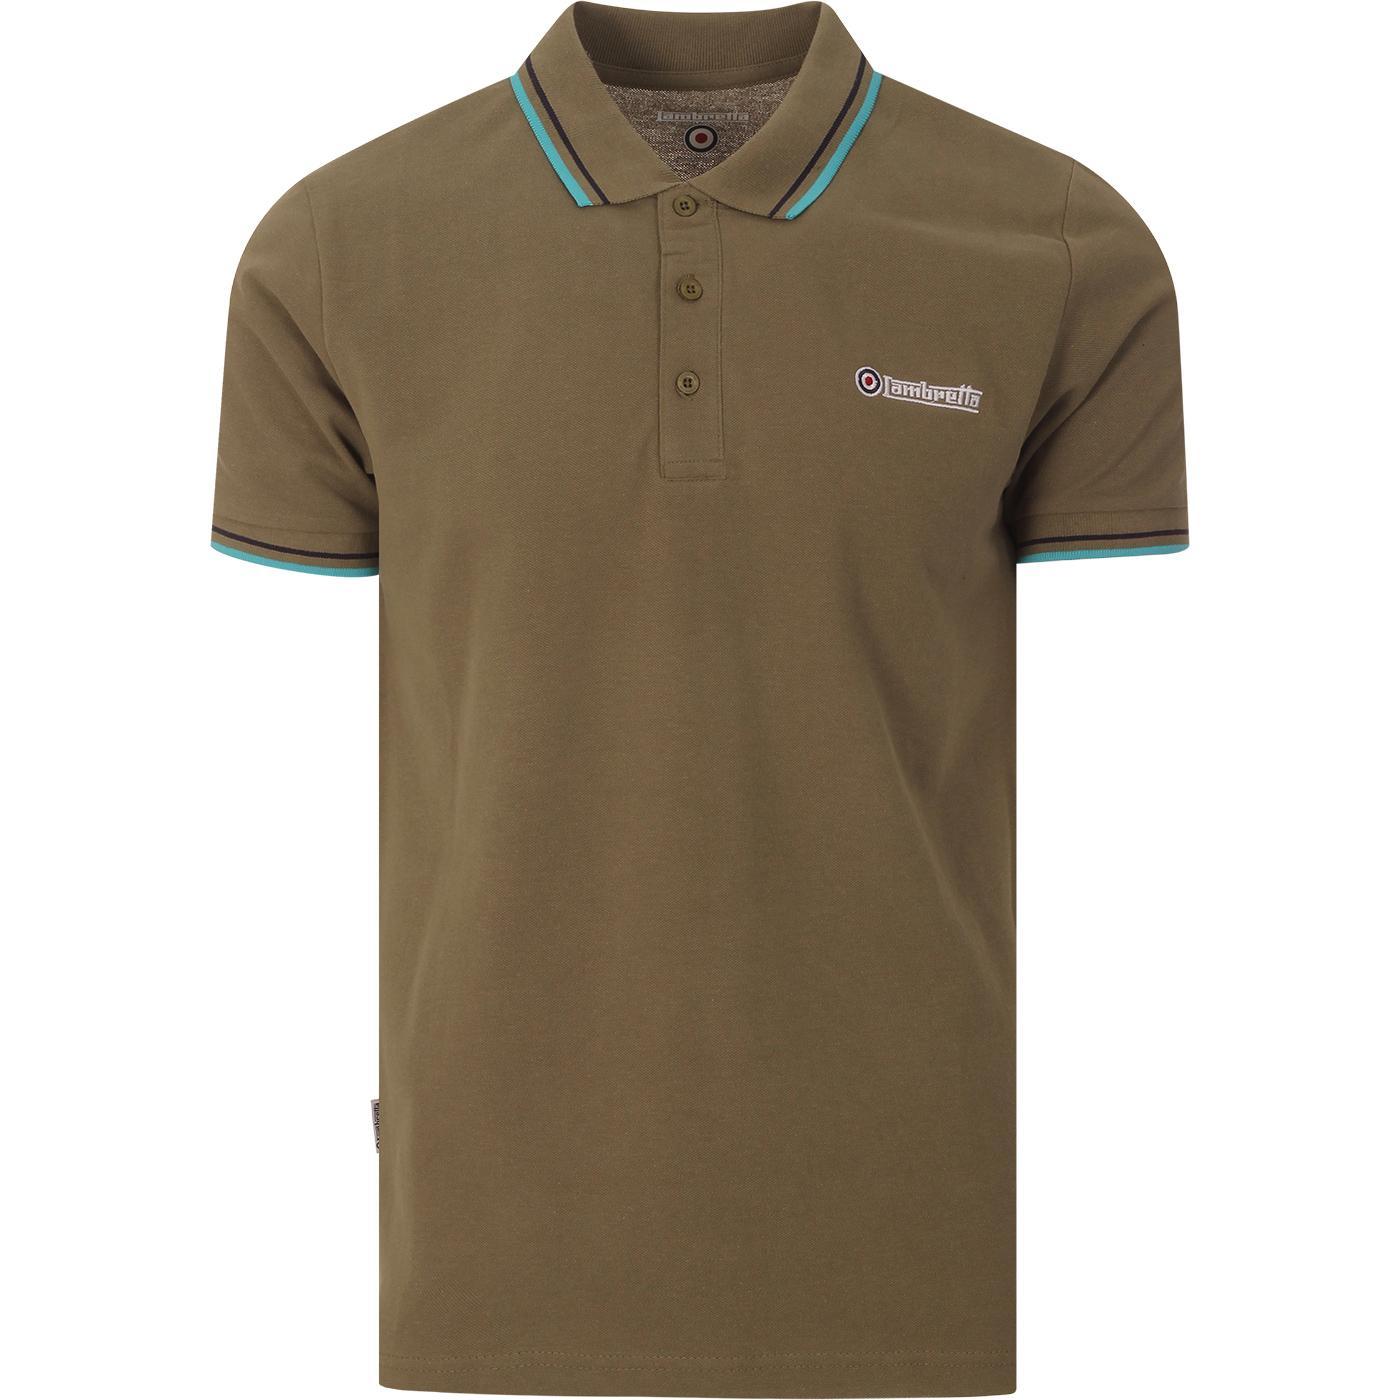 LAMBRETTA Retro Twin Tipped Pique Polo Shirt (LG)